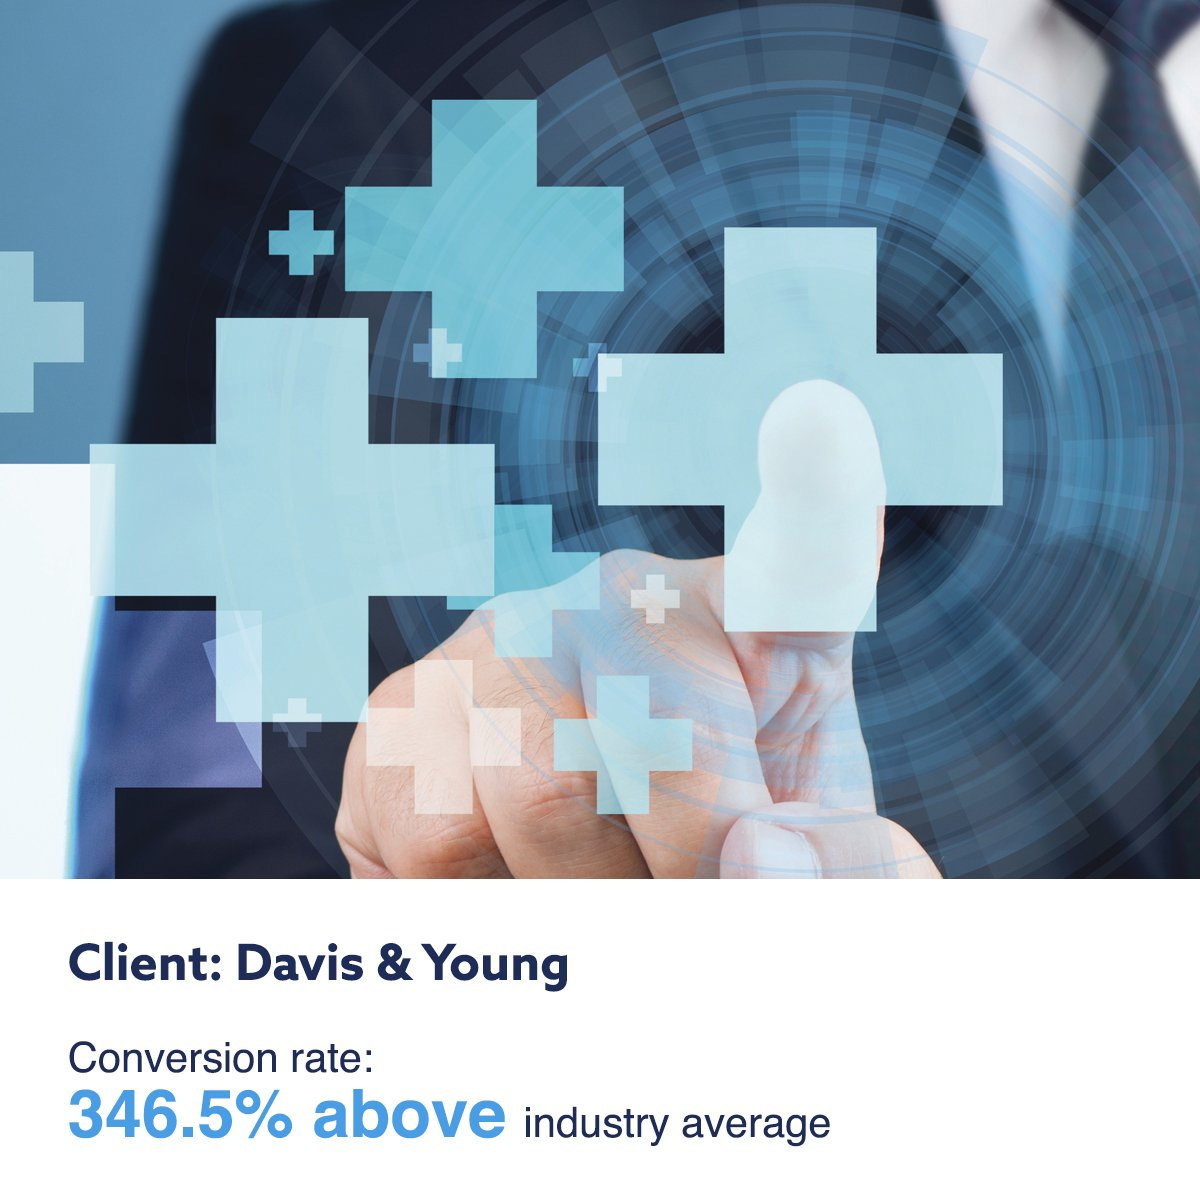 Davis & Young Google Ads Campaign 2